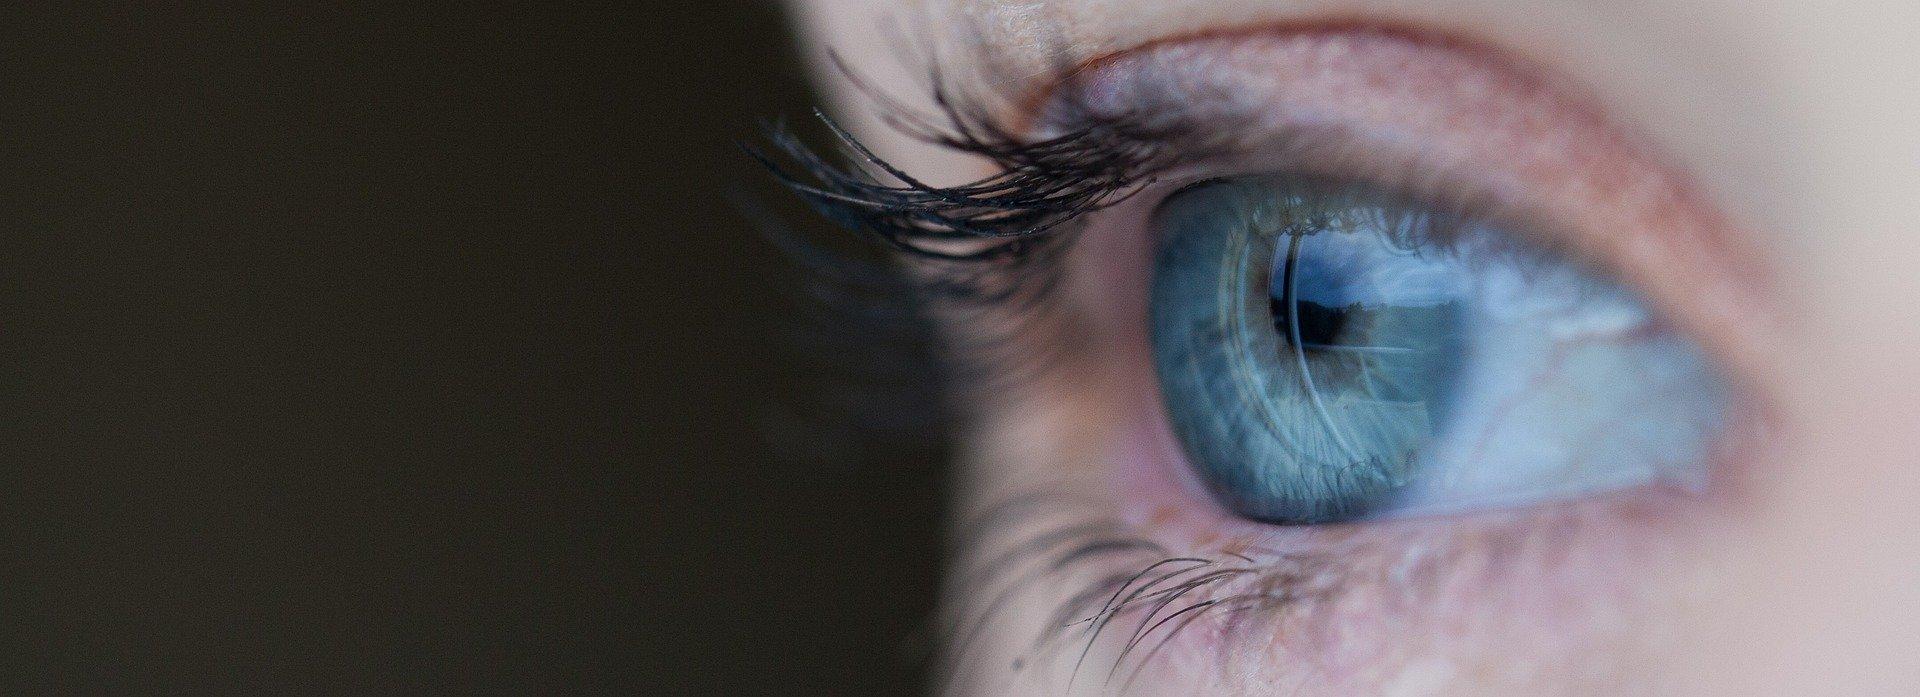 2019: 5 scoperte sorprendenti sulla visione